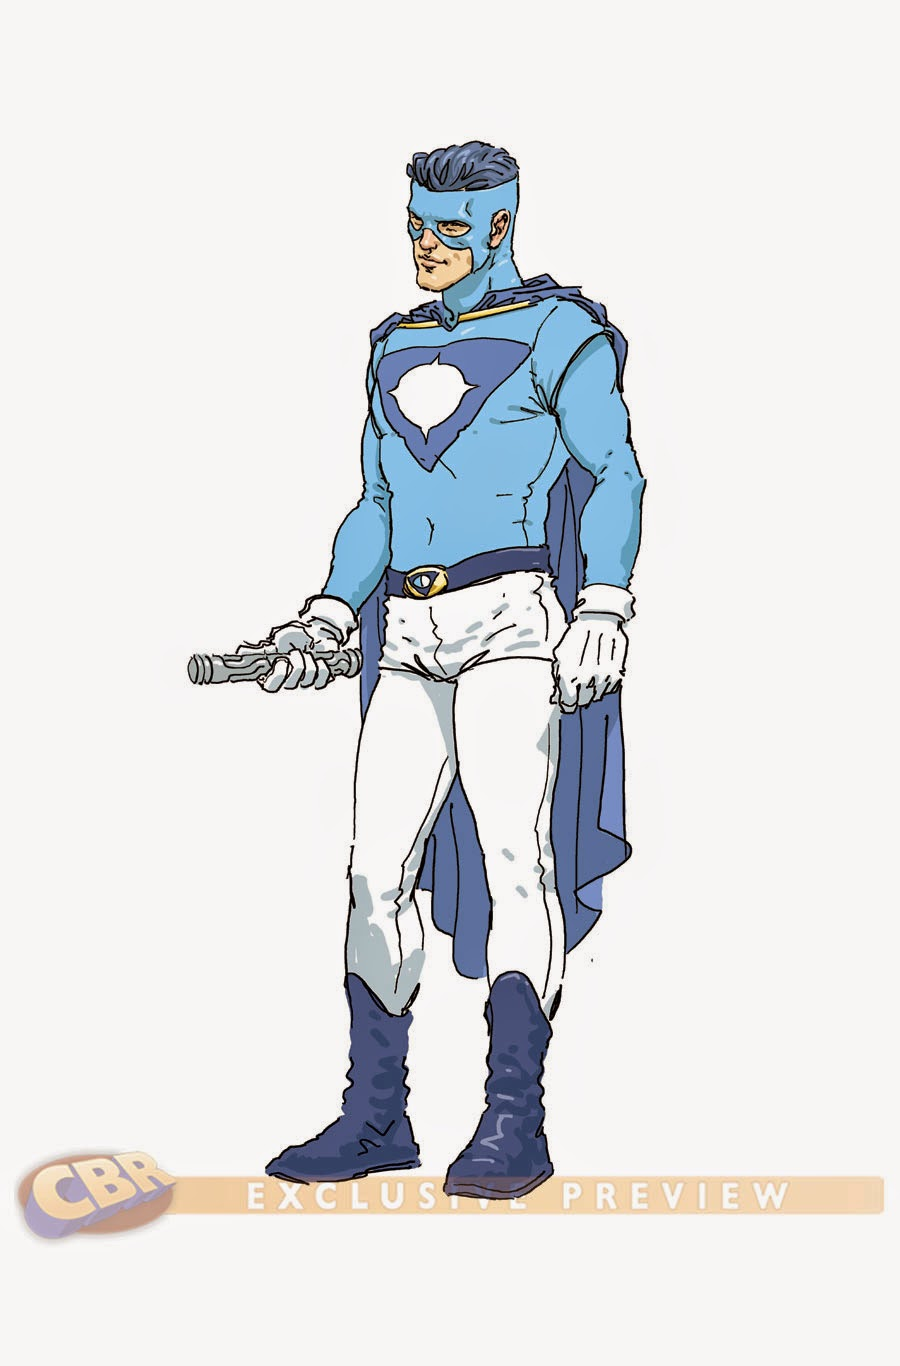 bluebolt2-richardconrad-4ce46